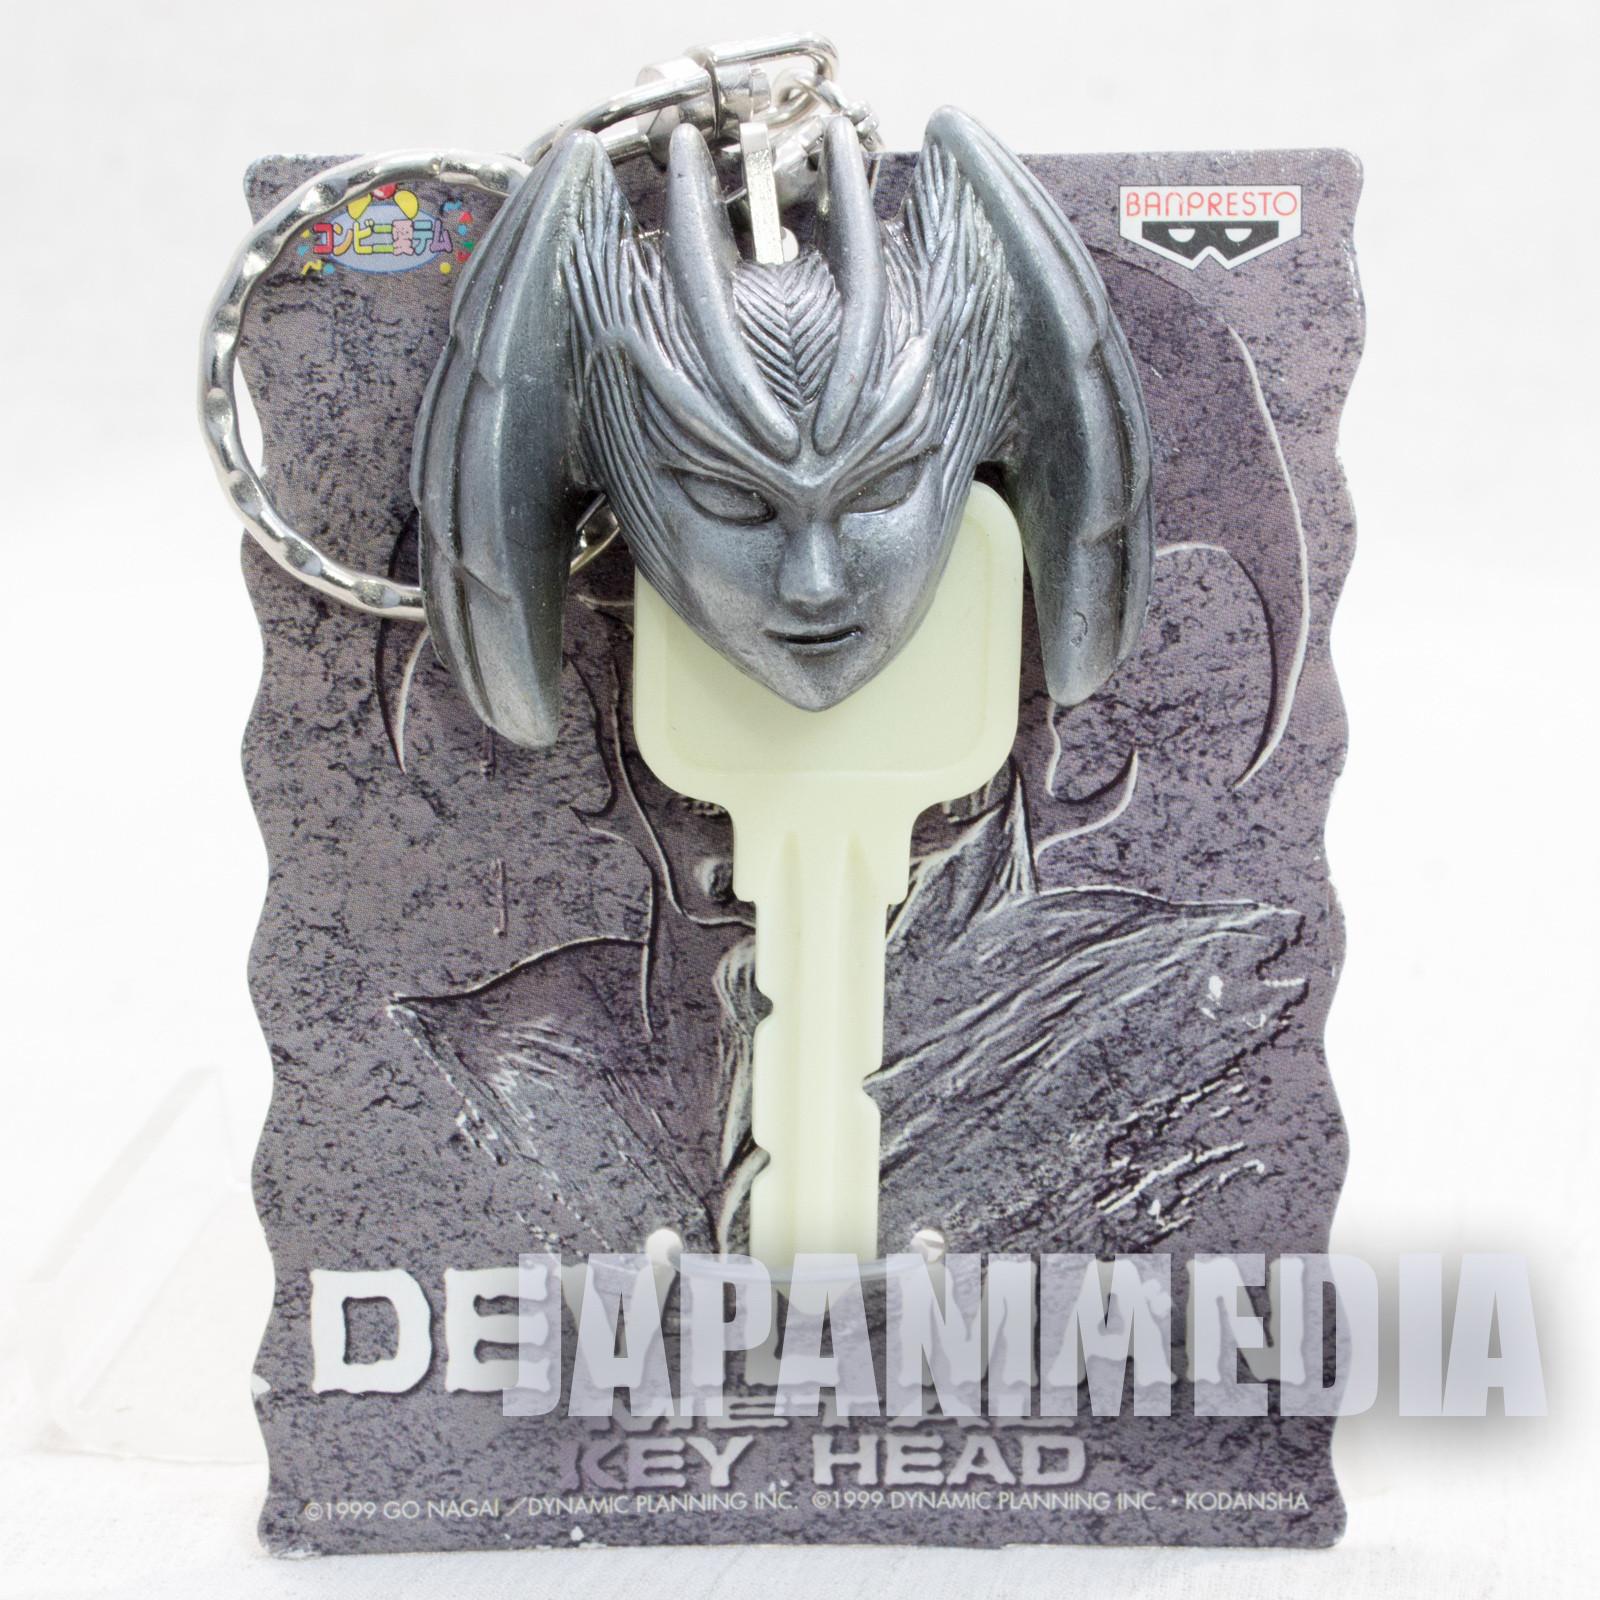 Devilman Sirene ver. Metal Key Head Cover Keychain Banpresto JAPAN ANIME